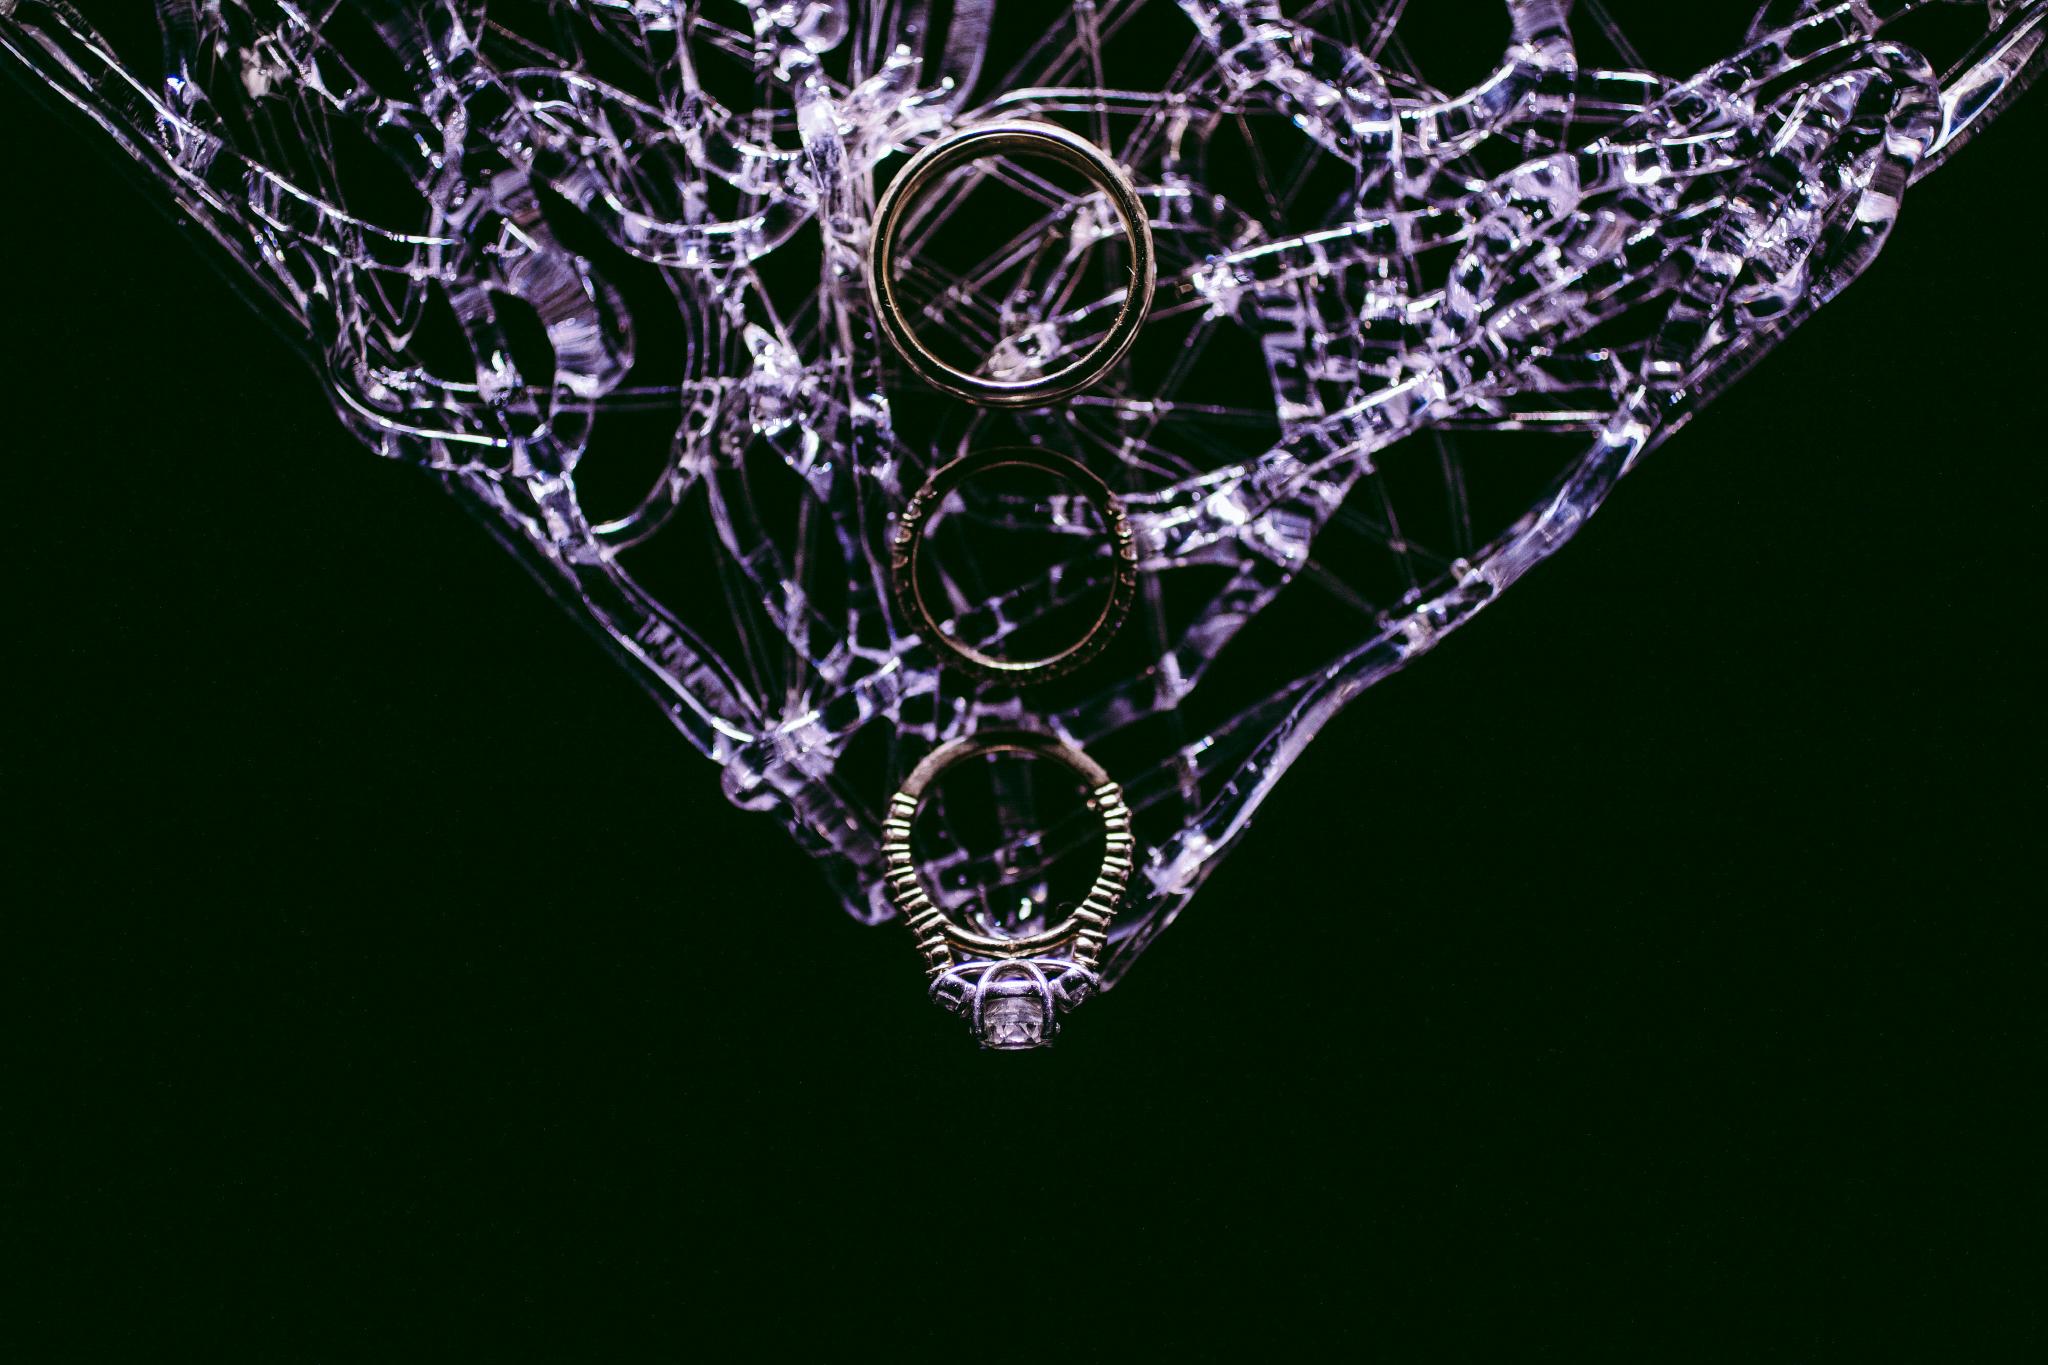 san diego wedding   photographer | 3 rings arranged in vertical order